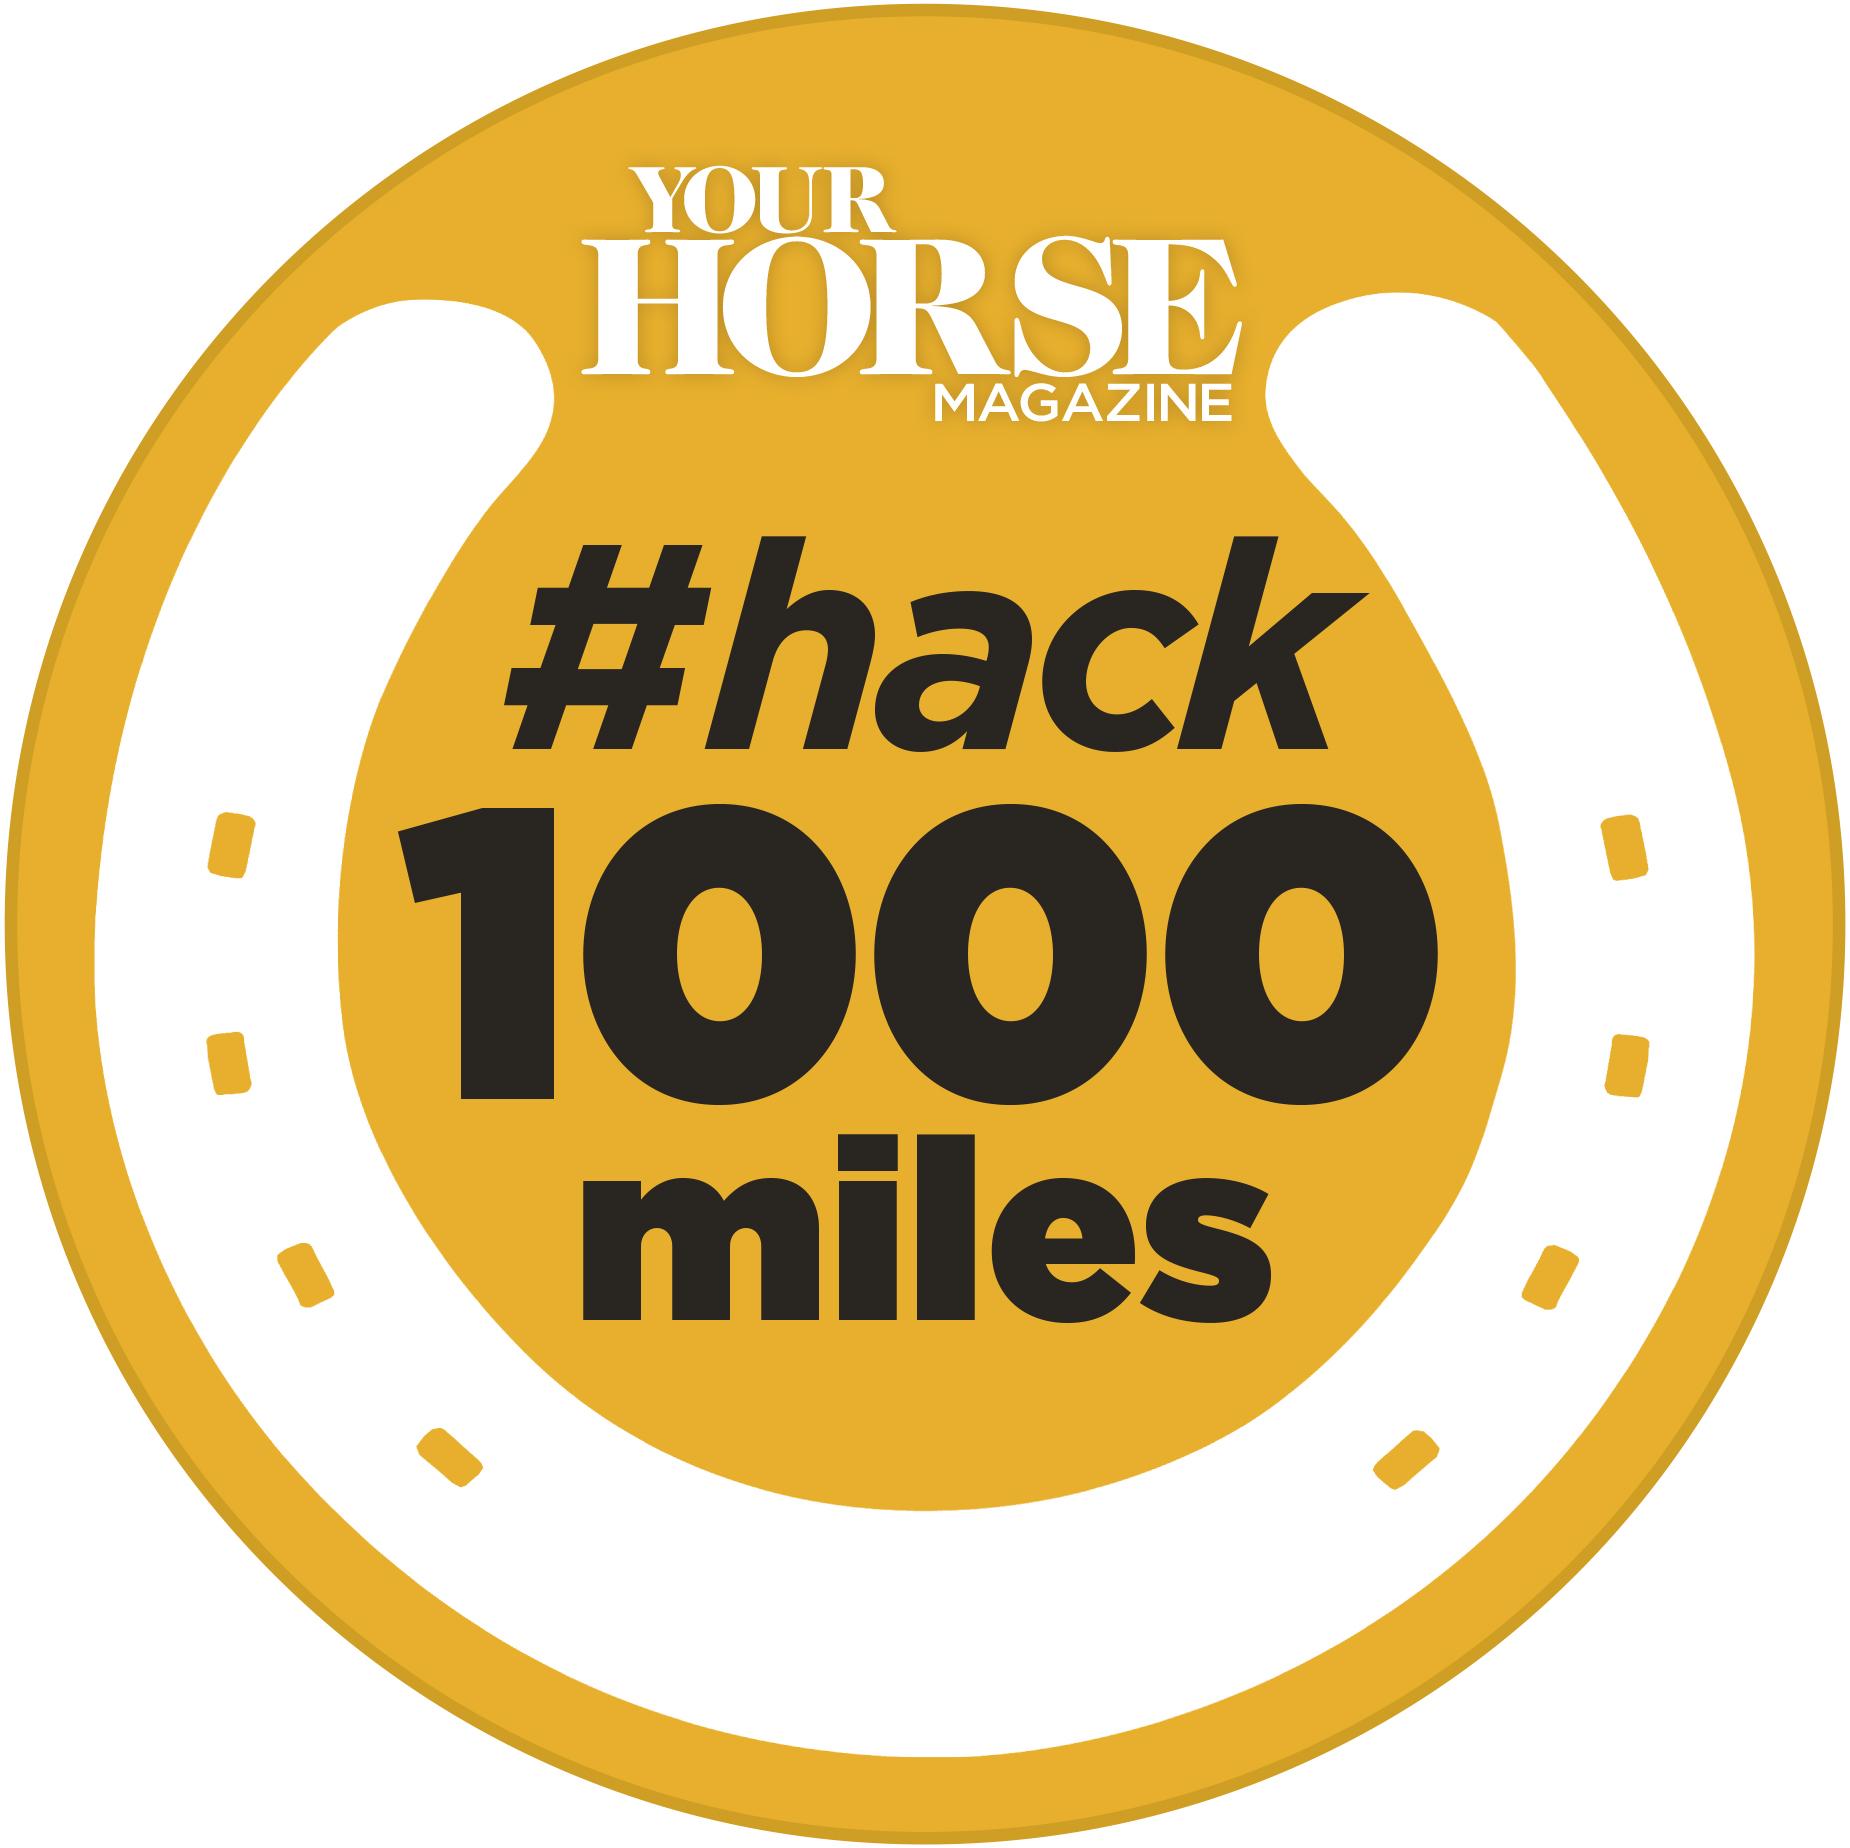 Hack1000mls(gold)logo.jpg